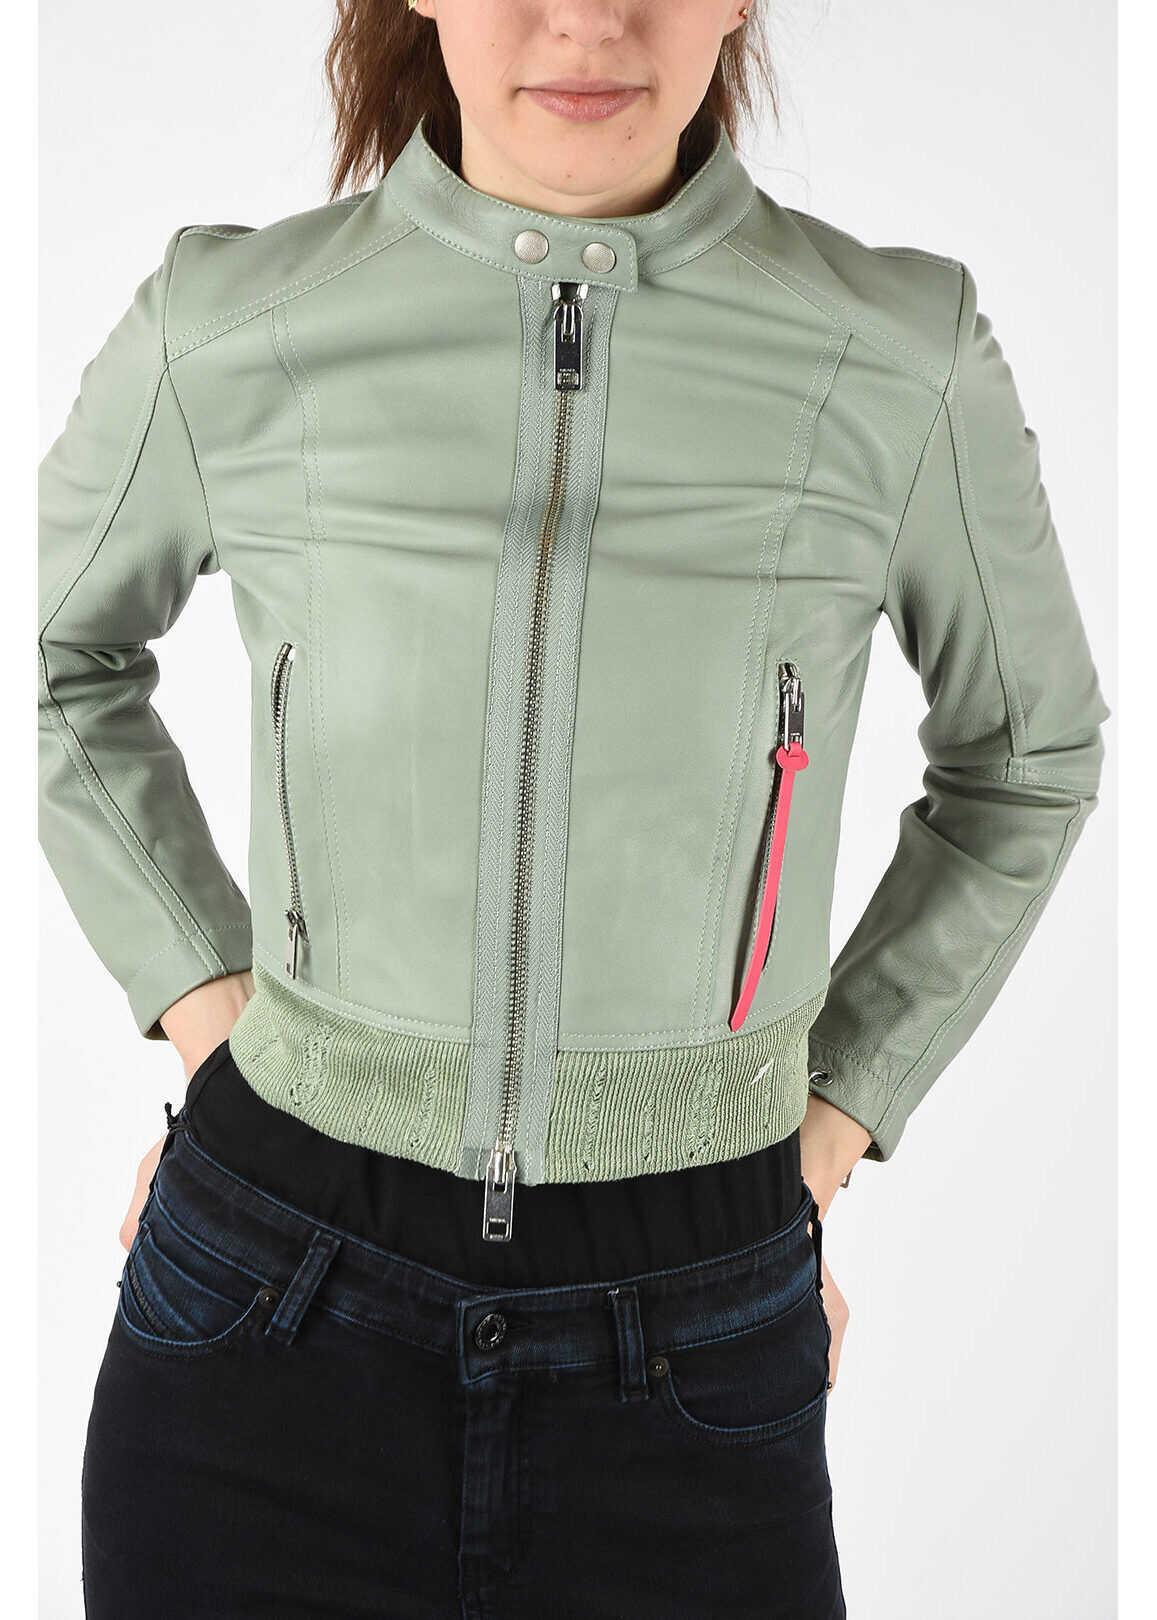 Diesel Leather L-LYSSA-C Crop Jacket LIGHT BLUE